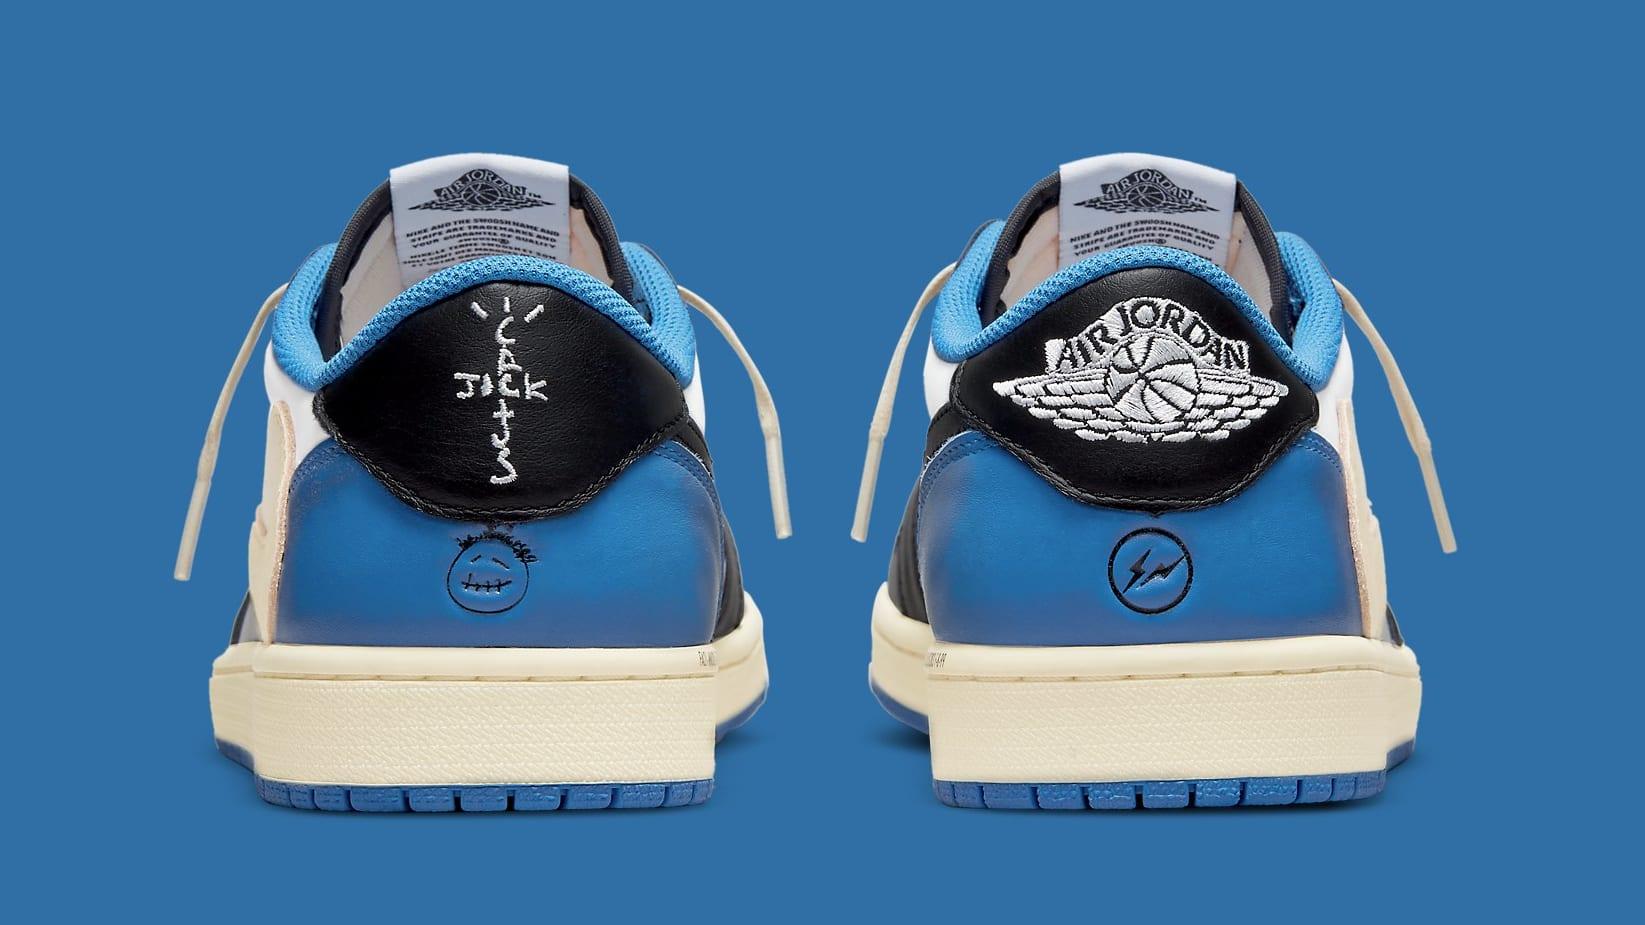 Travis Scott x Fragment x Air Jordan 1 Low Release Date DM7866-140 Heel